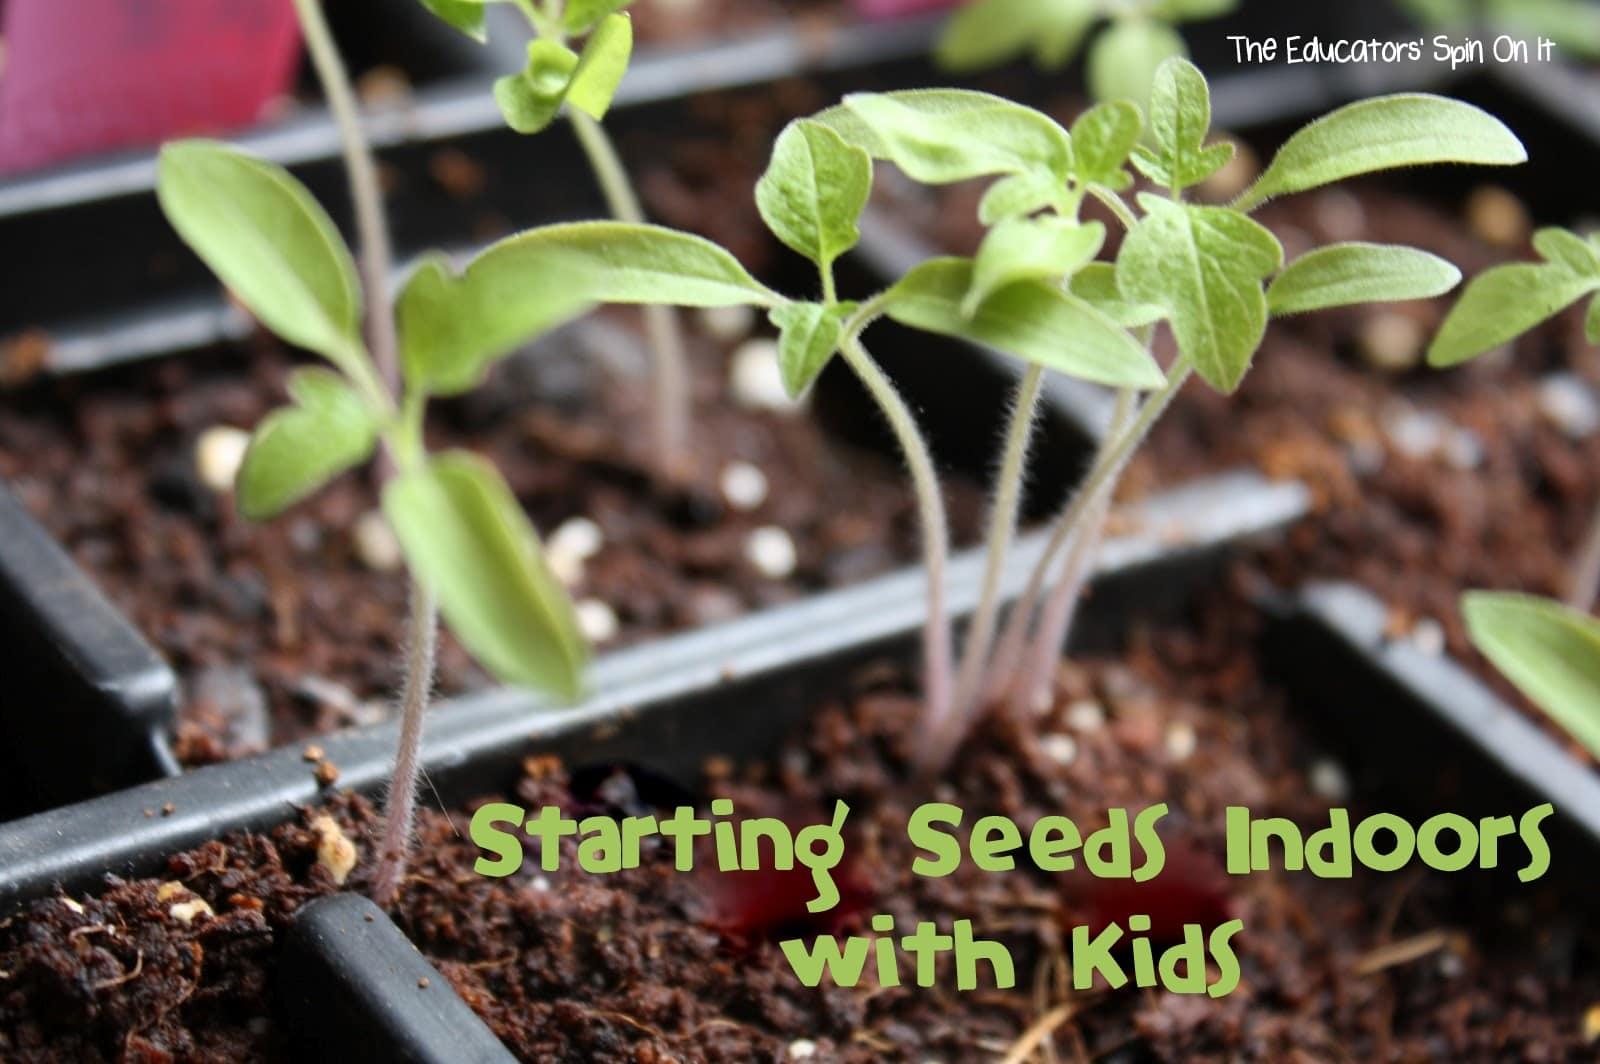 The Learning Garden